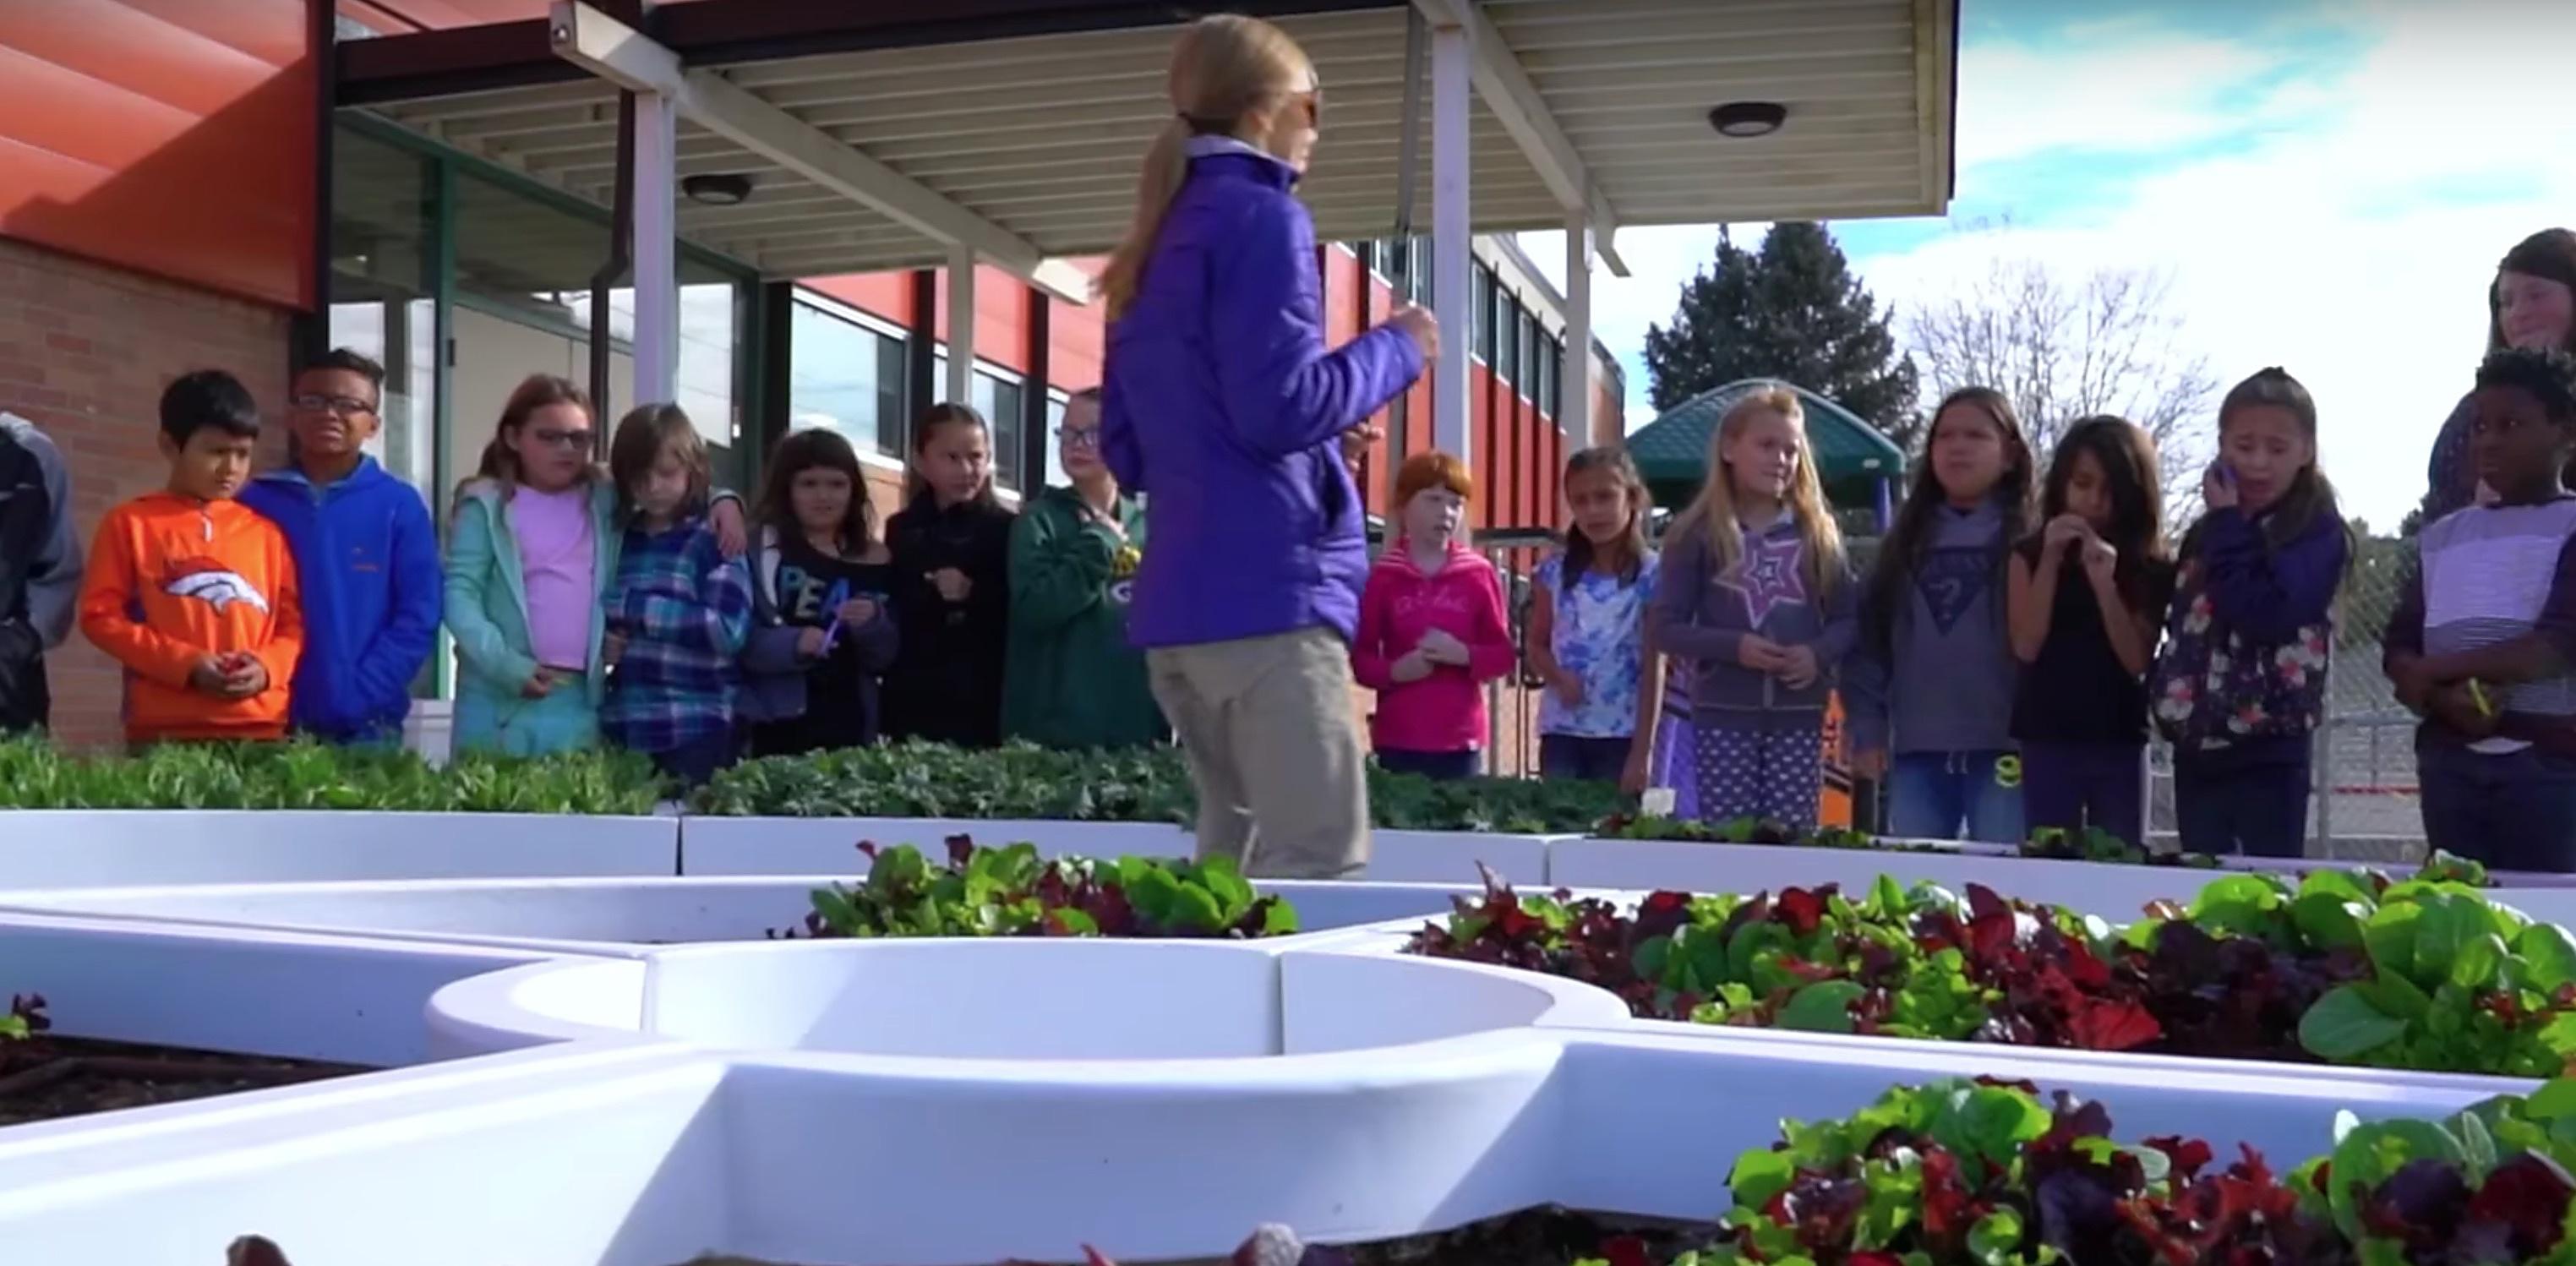 kimbal-musk-learning-gardens-school